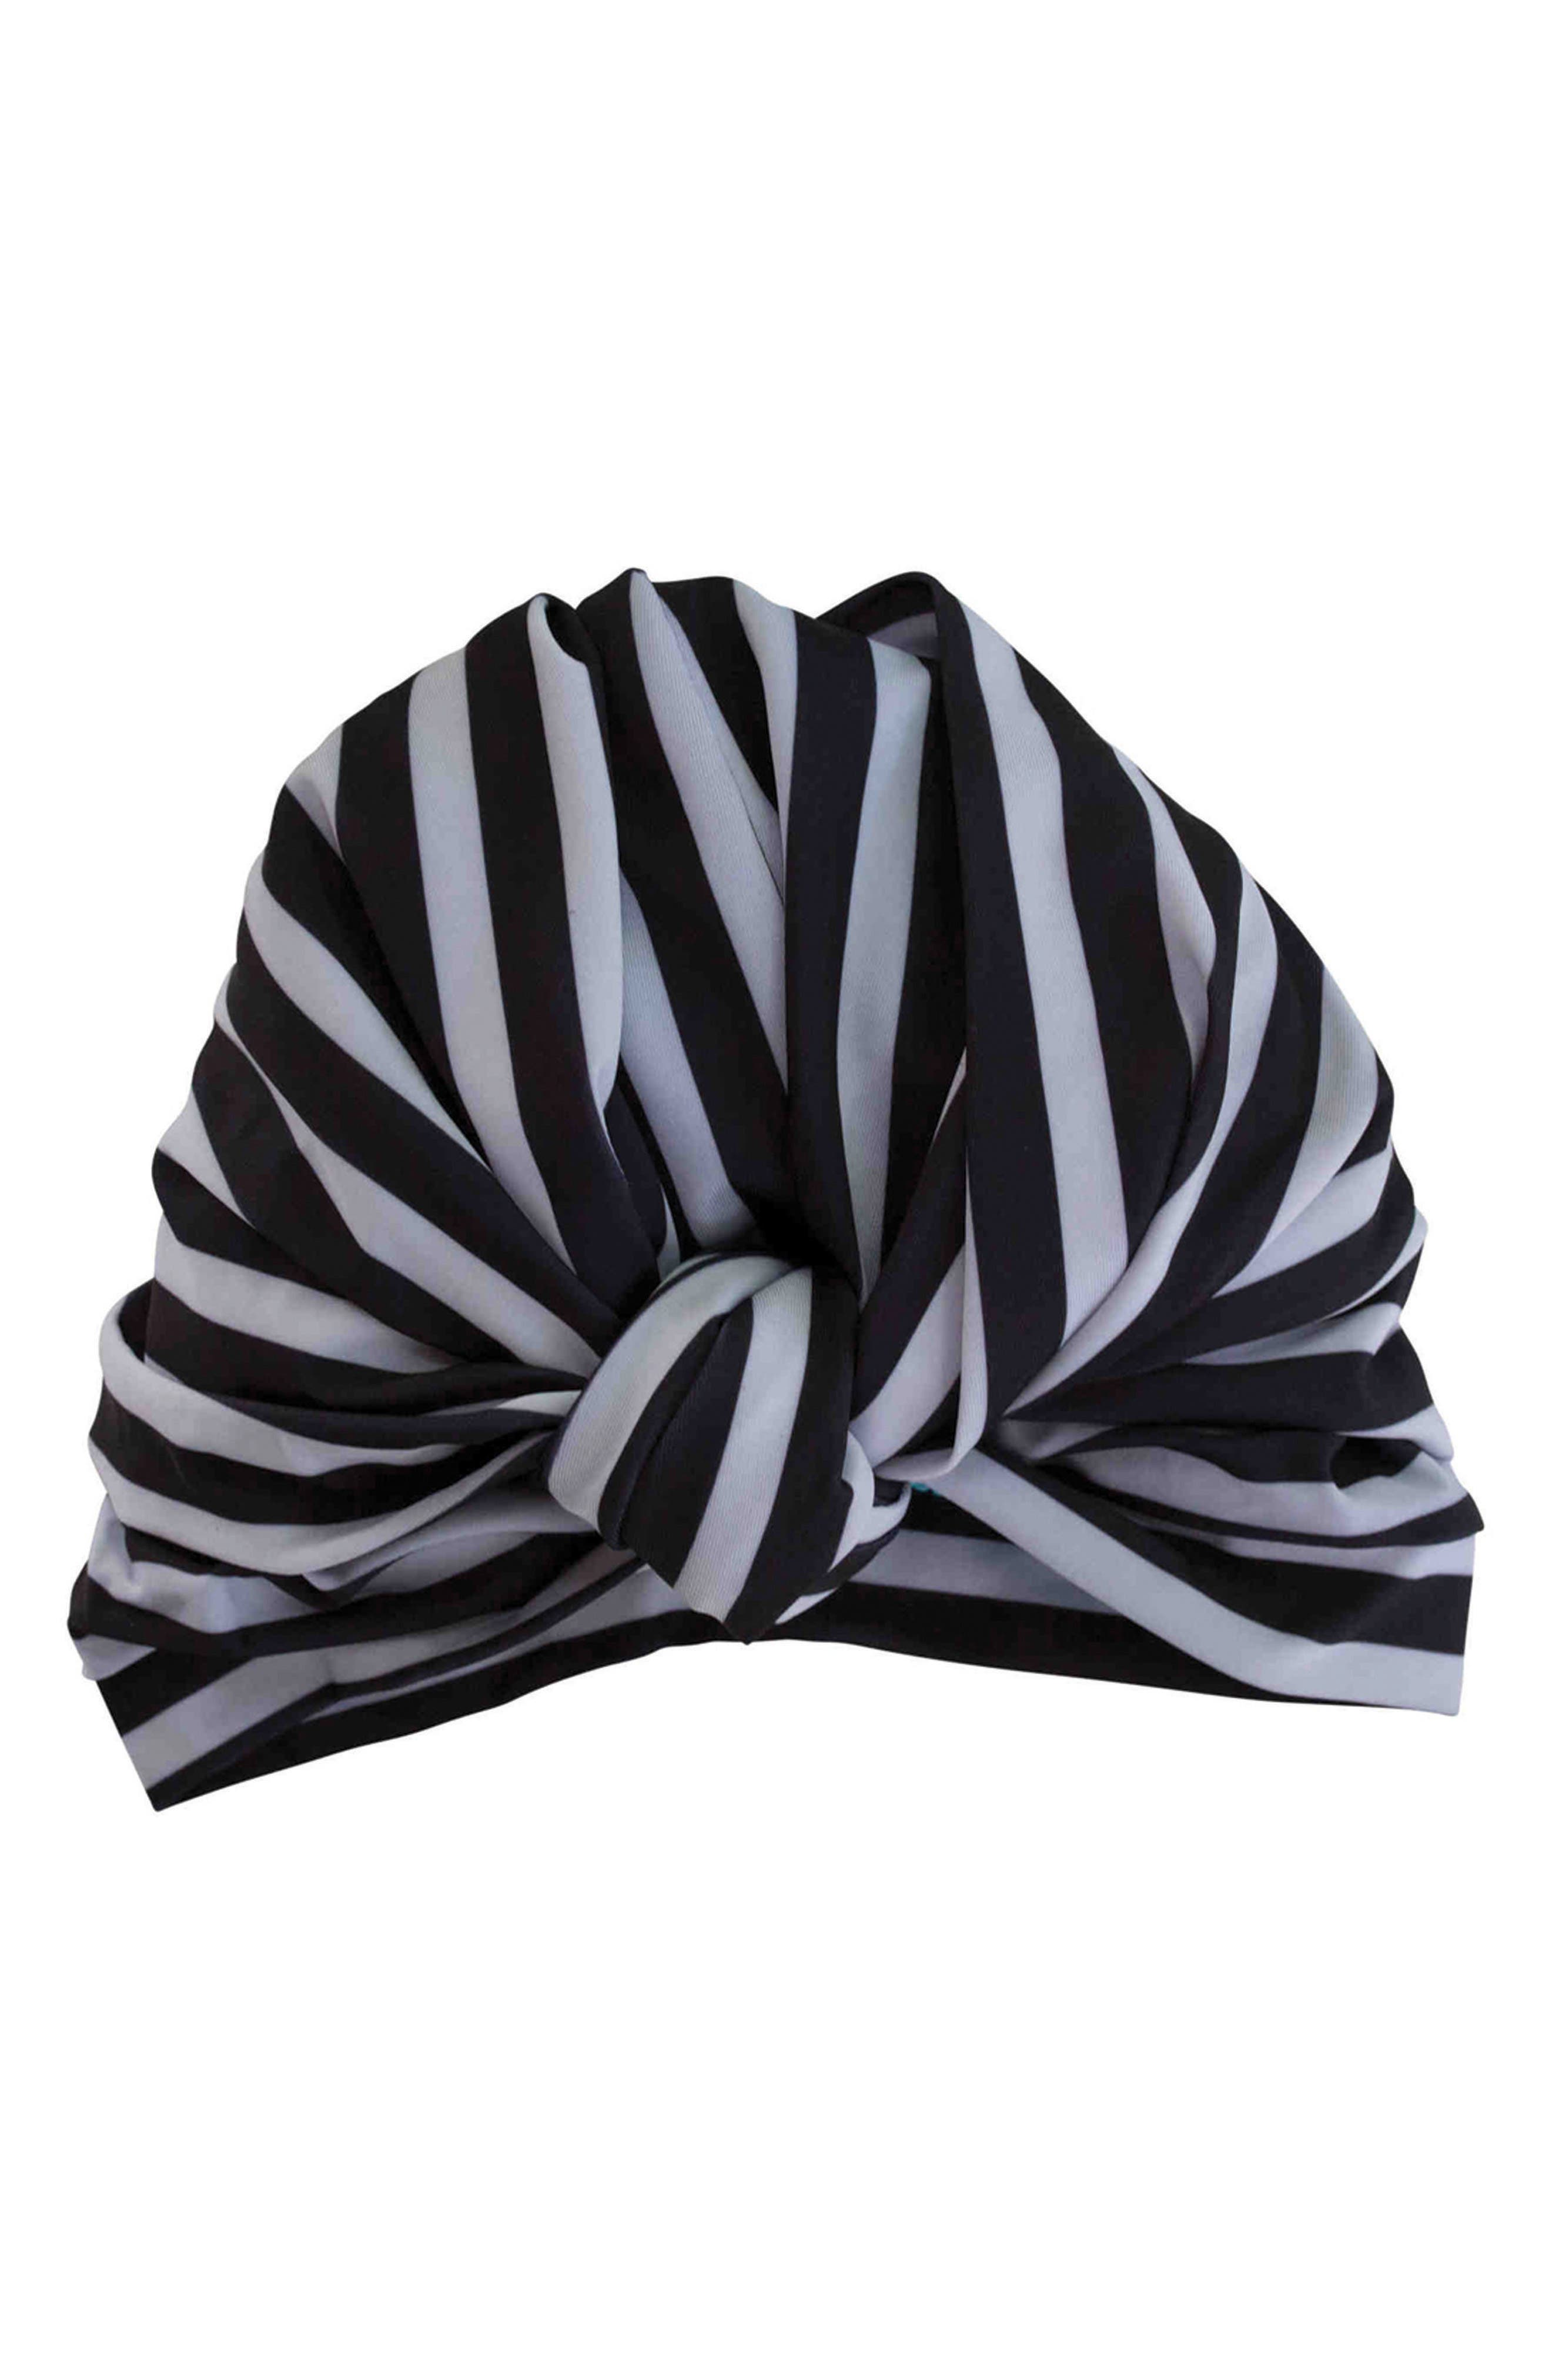 Dahlia Turban Shower Cap,                         Main,                         color, Monochrome Stripe